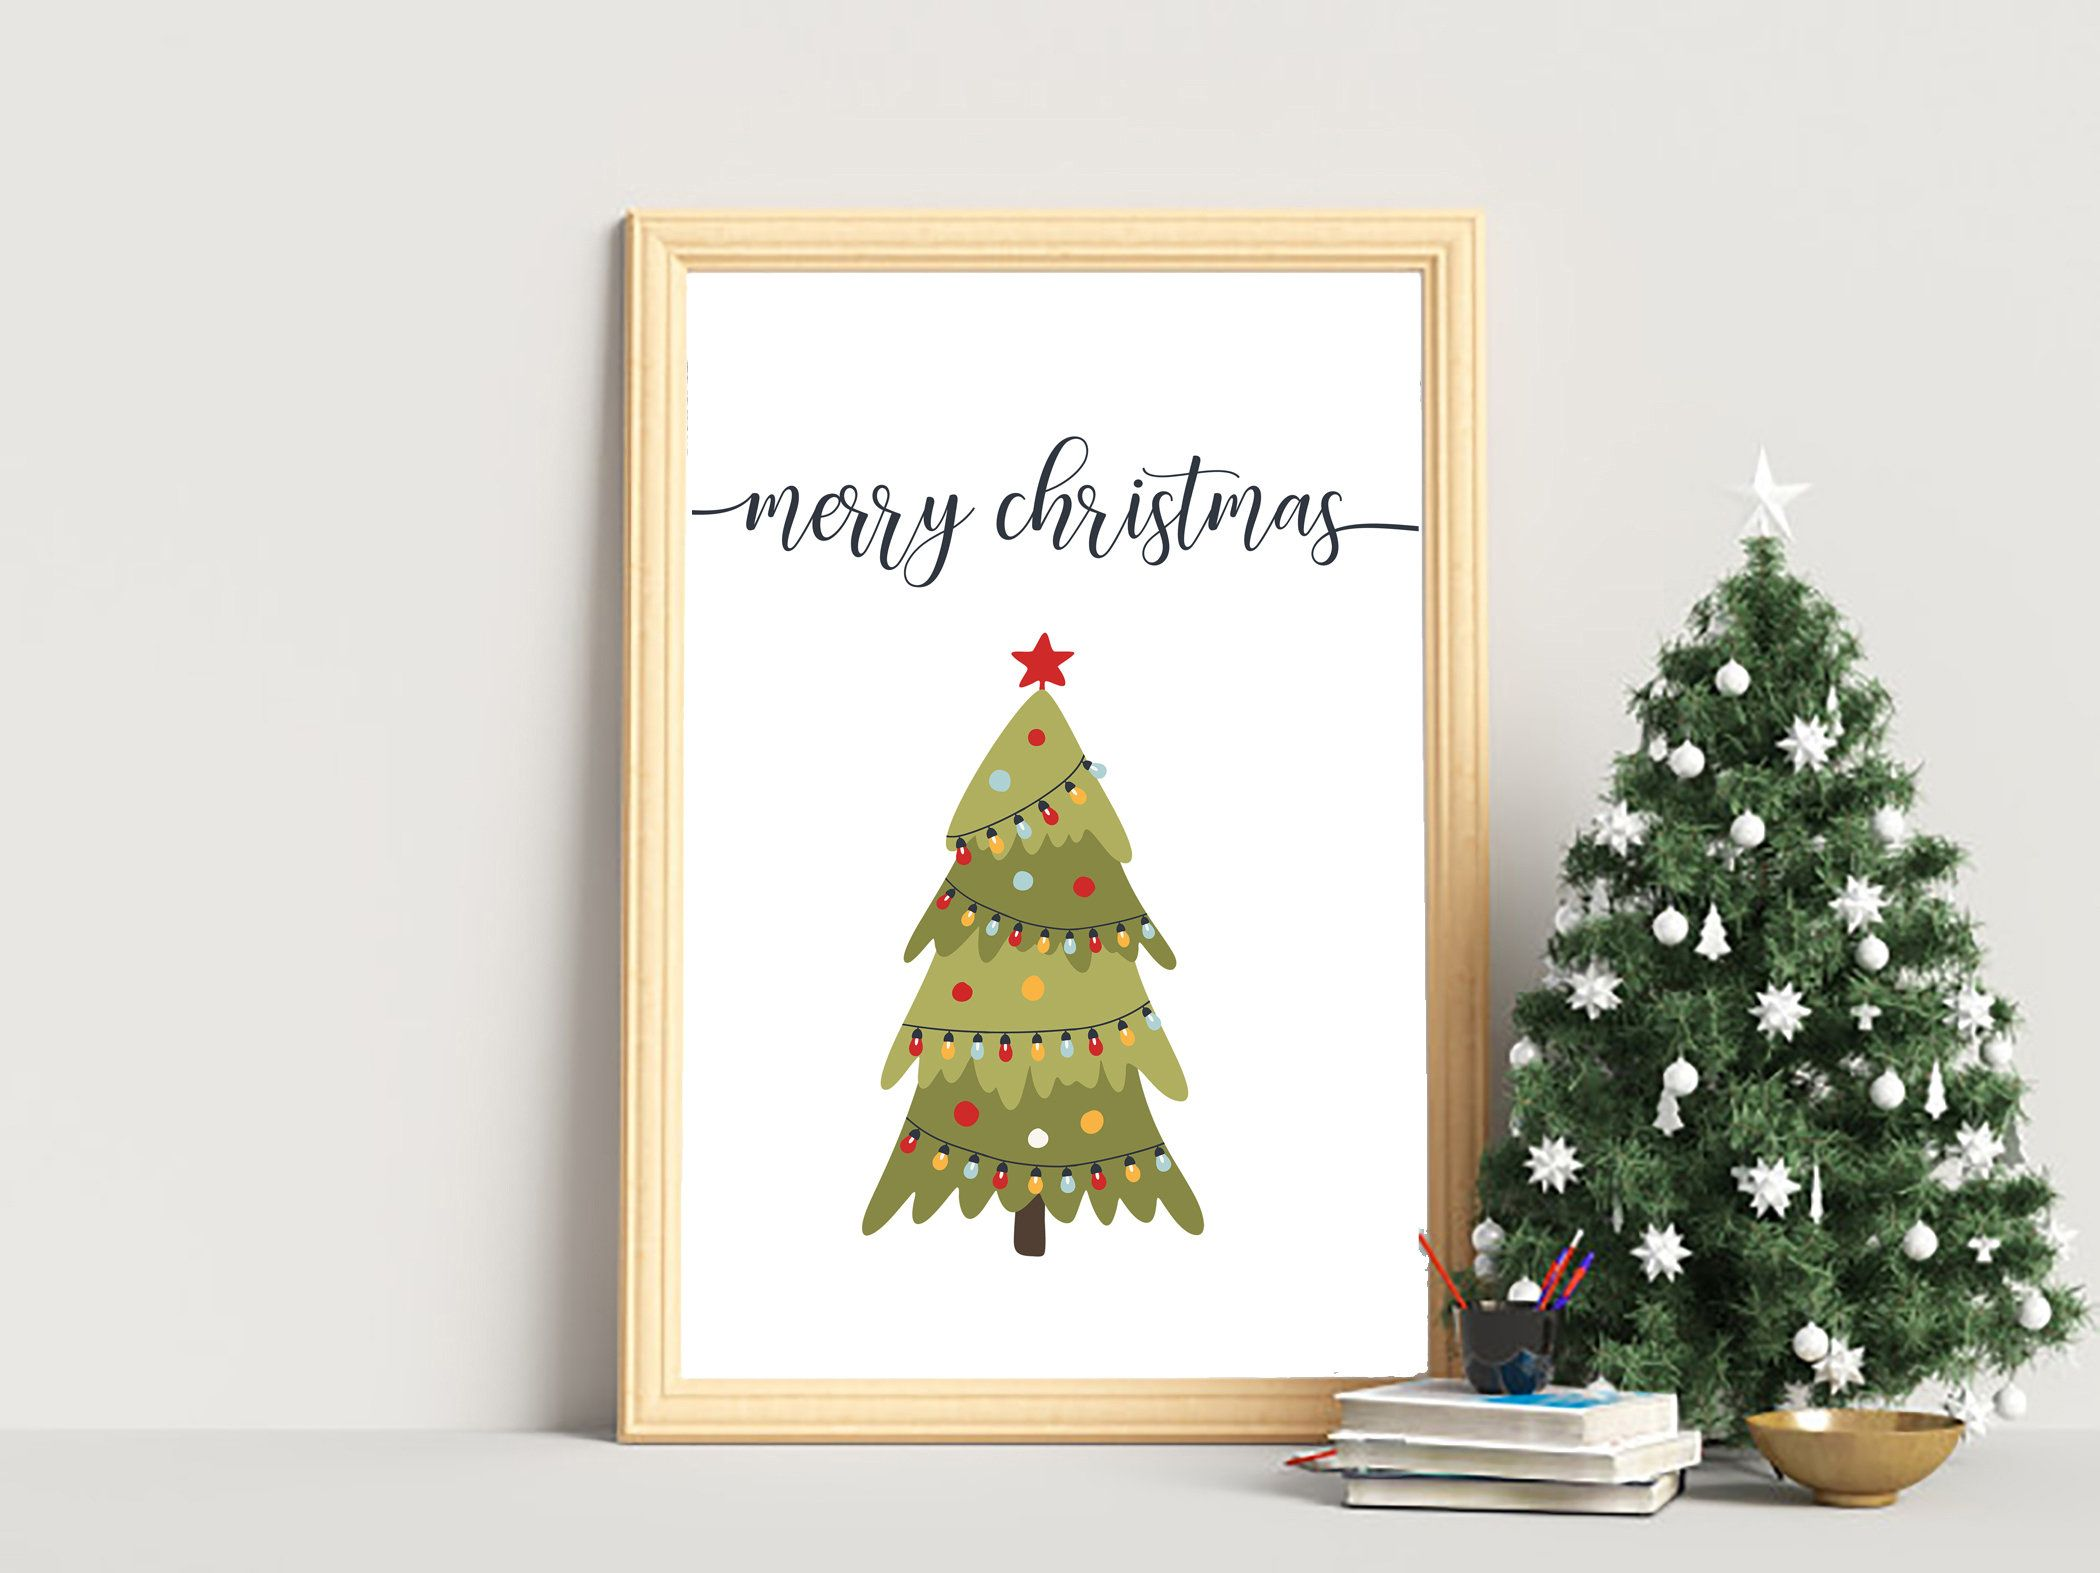 Christmas Tree Wall Art Digital Download Merry Christmas Print Christmas Tree Print Printable Wall Art E Christmas Wall Art Tree Wall Art Christmas Prints